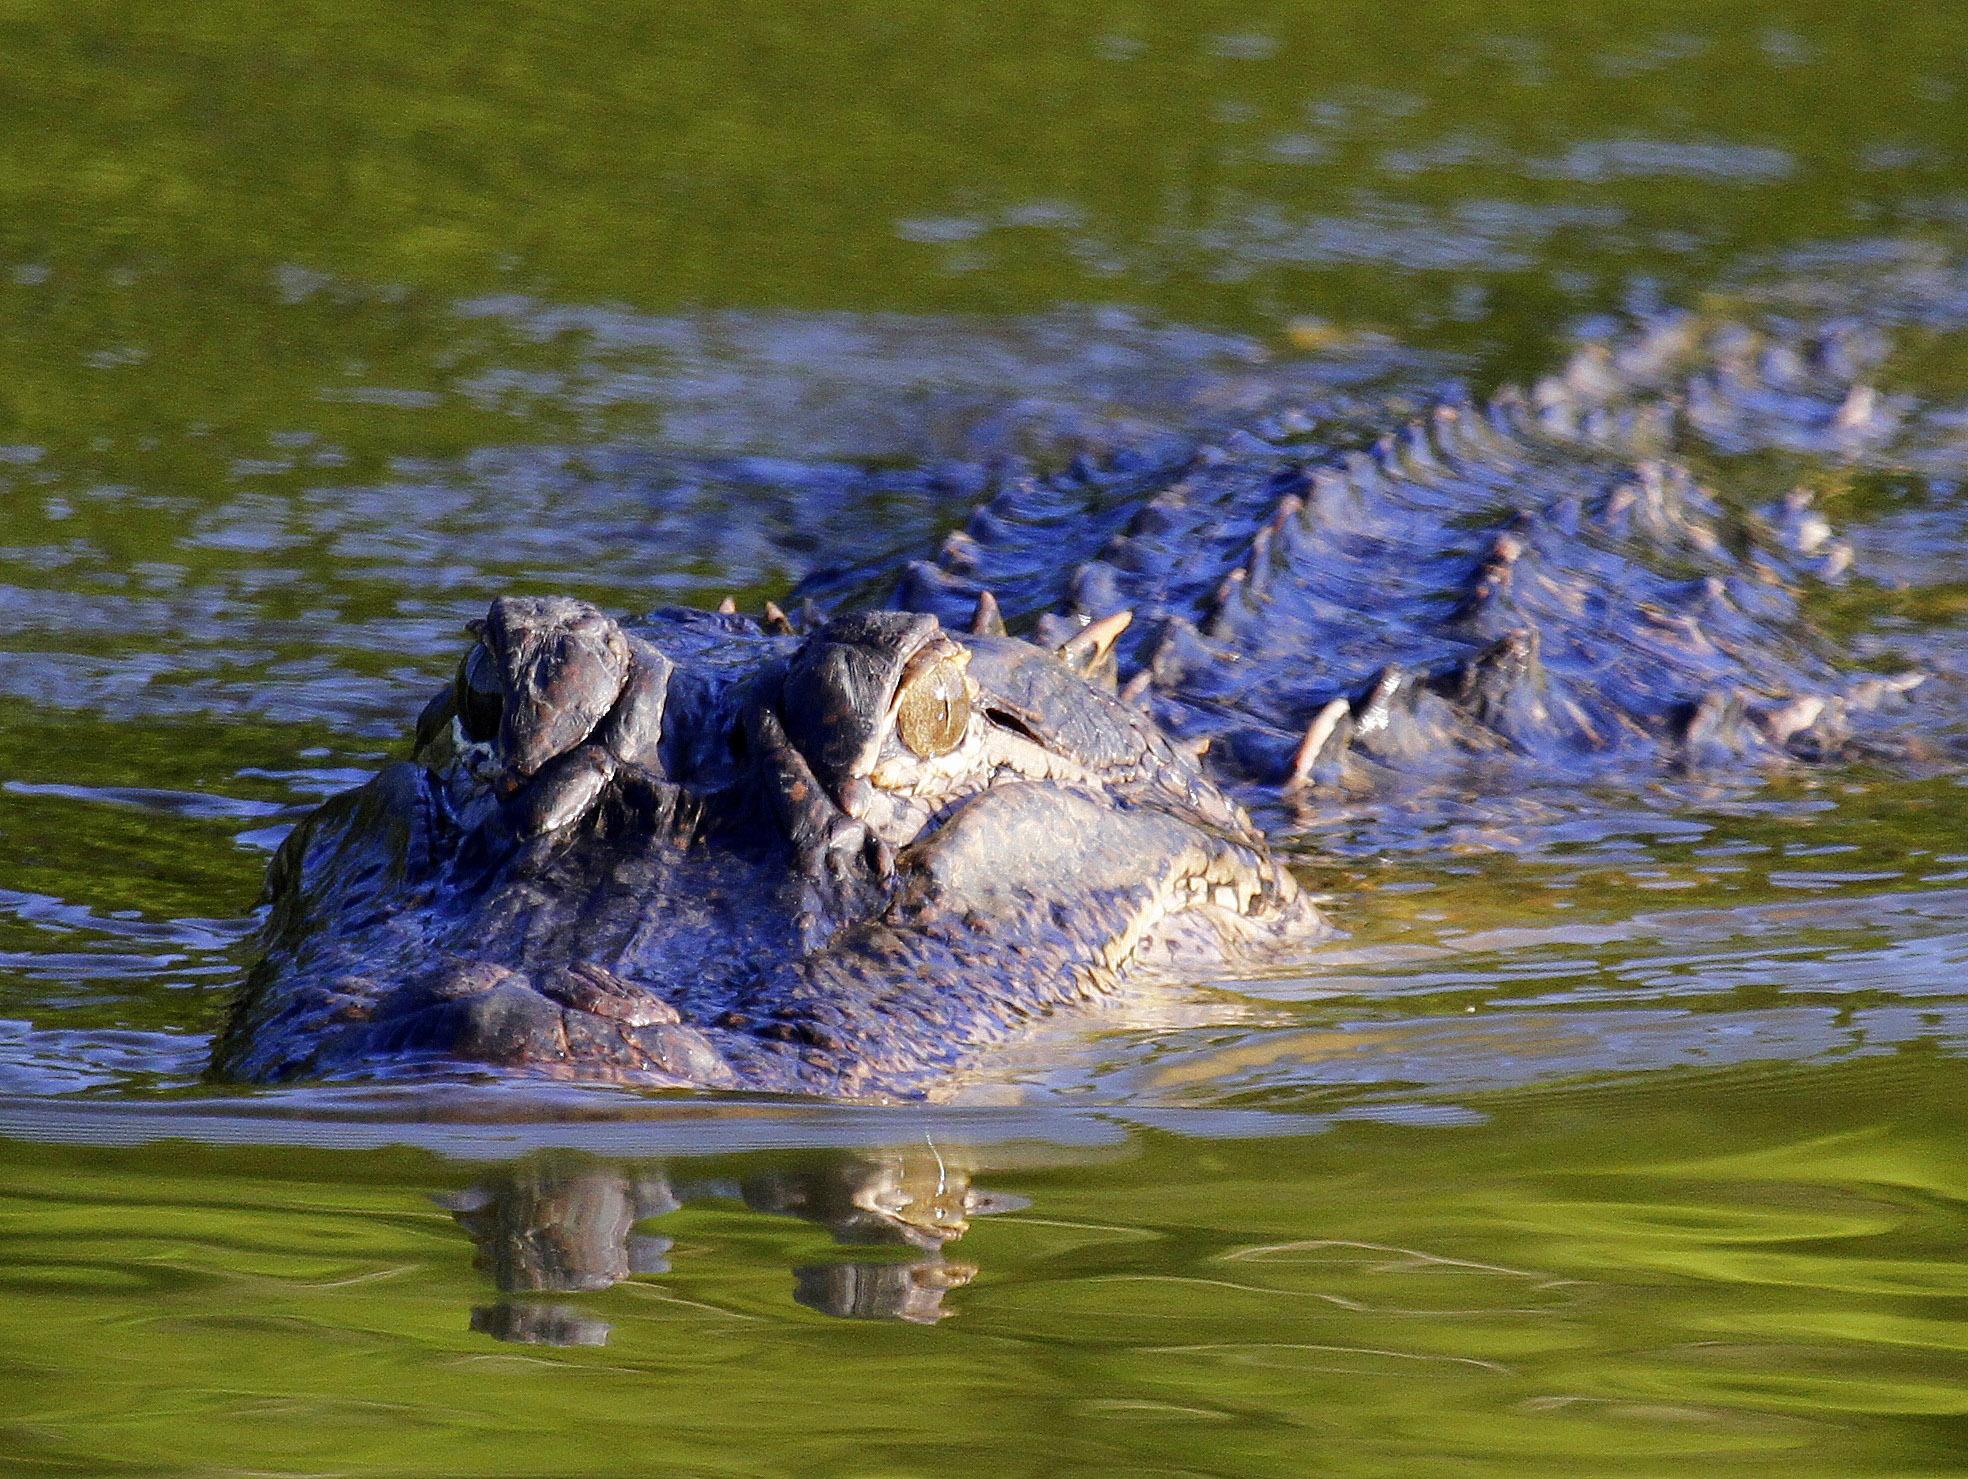 Flourishing Texas Gator Population On The Move During Mating Season Houston Chronicle